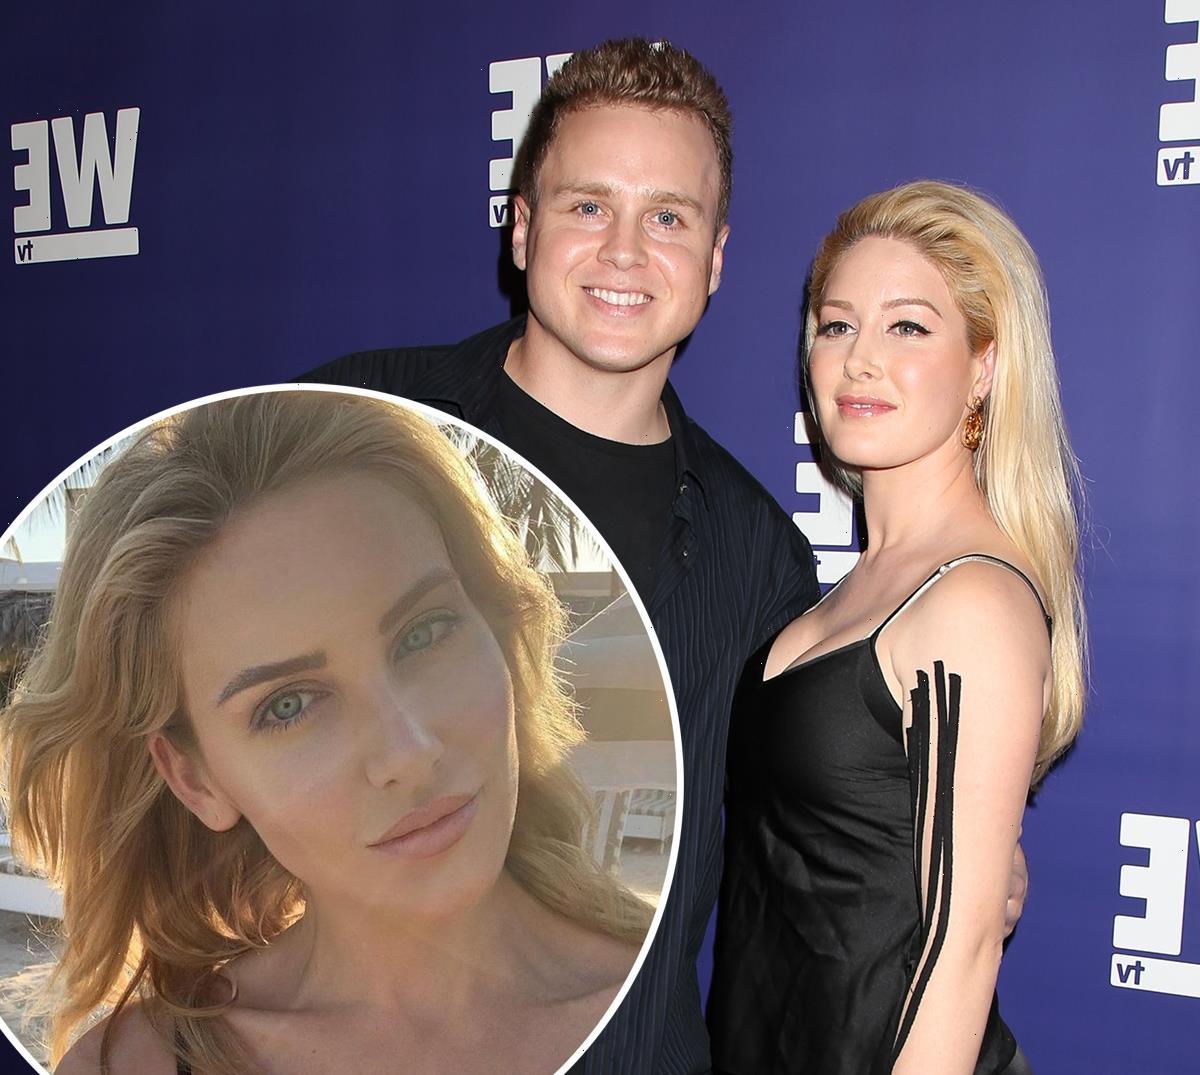 Spencer Pratt Fires Back At Sister Stephanie For Body Shaming Heidi Montag With FAKE Pregnancy Post